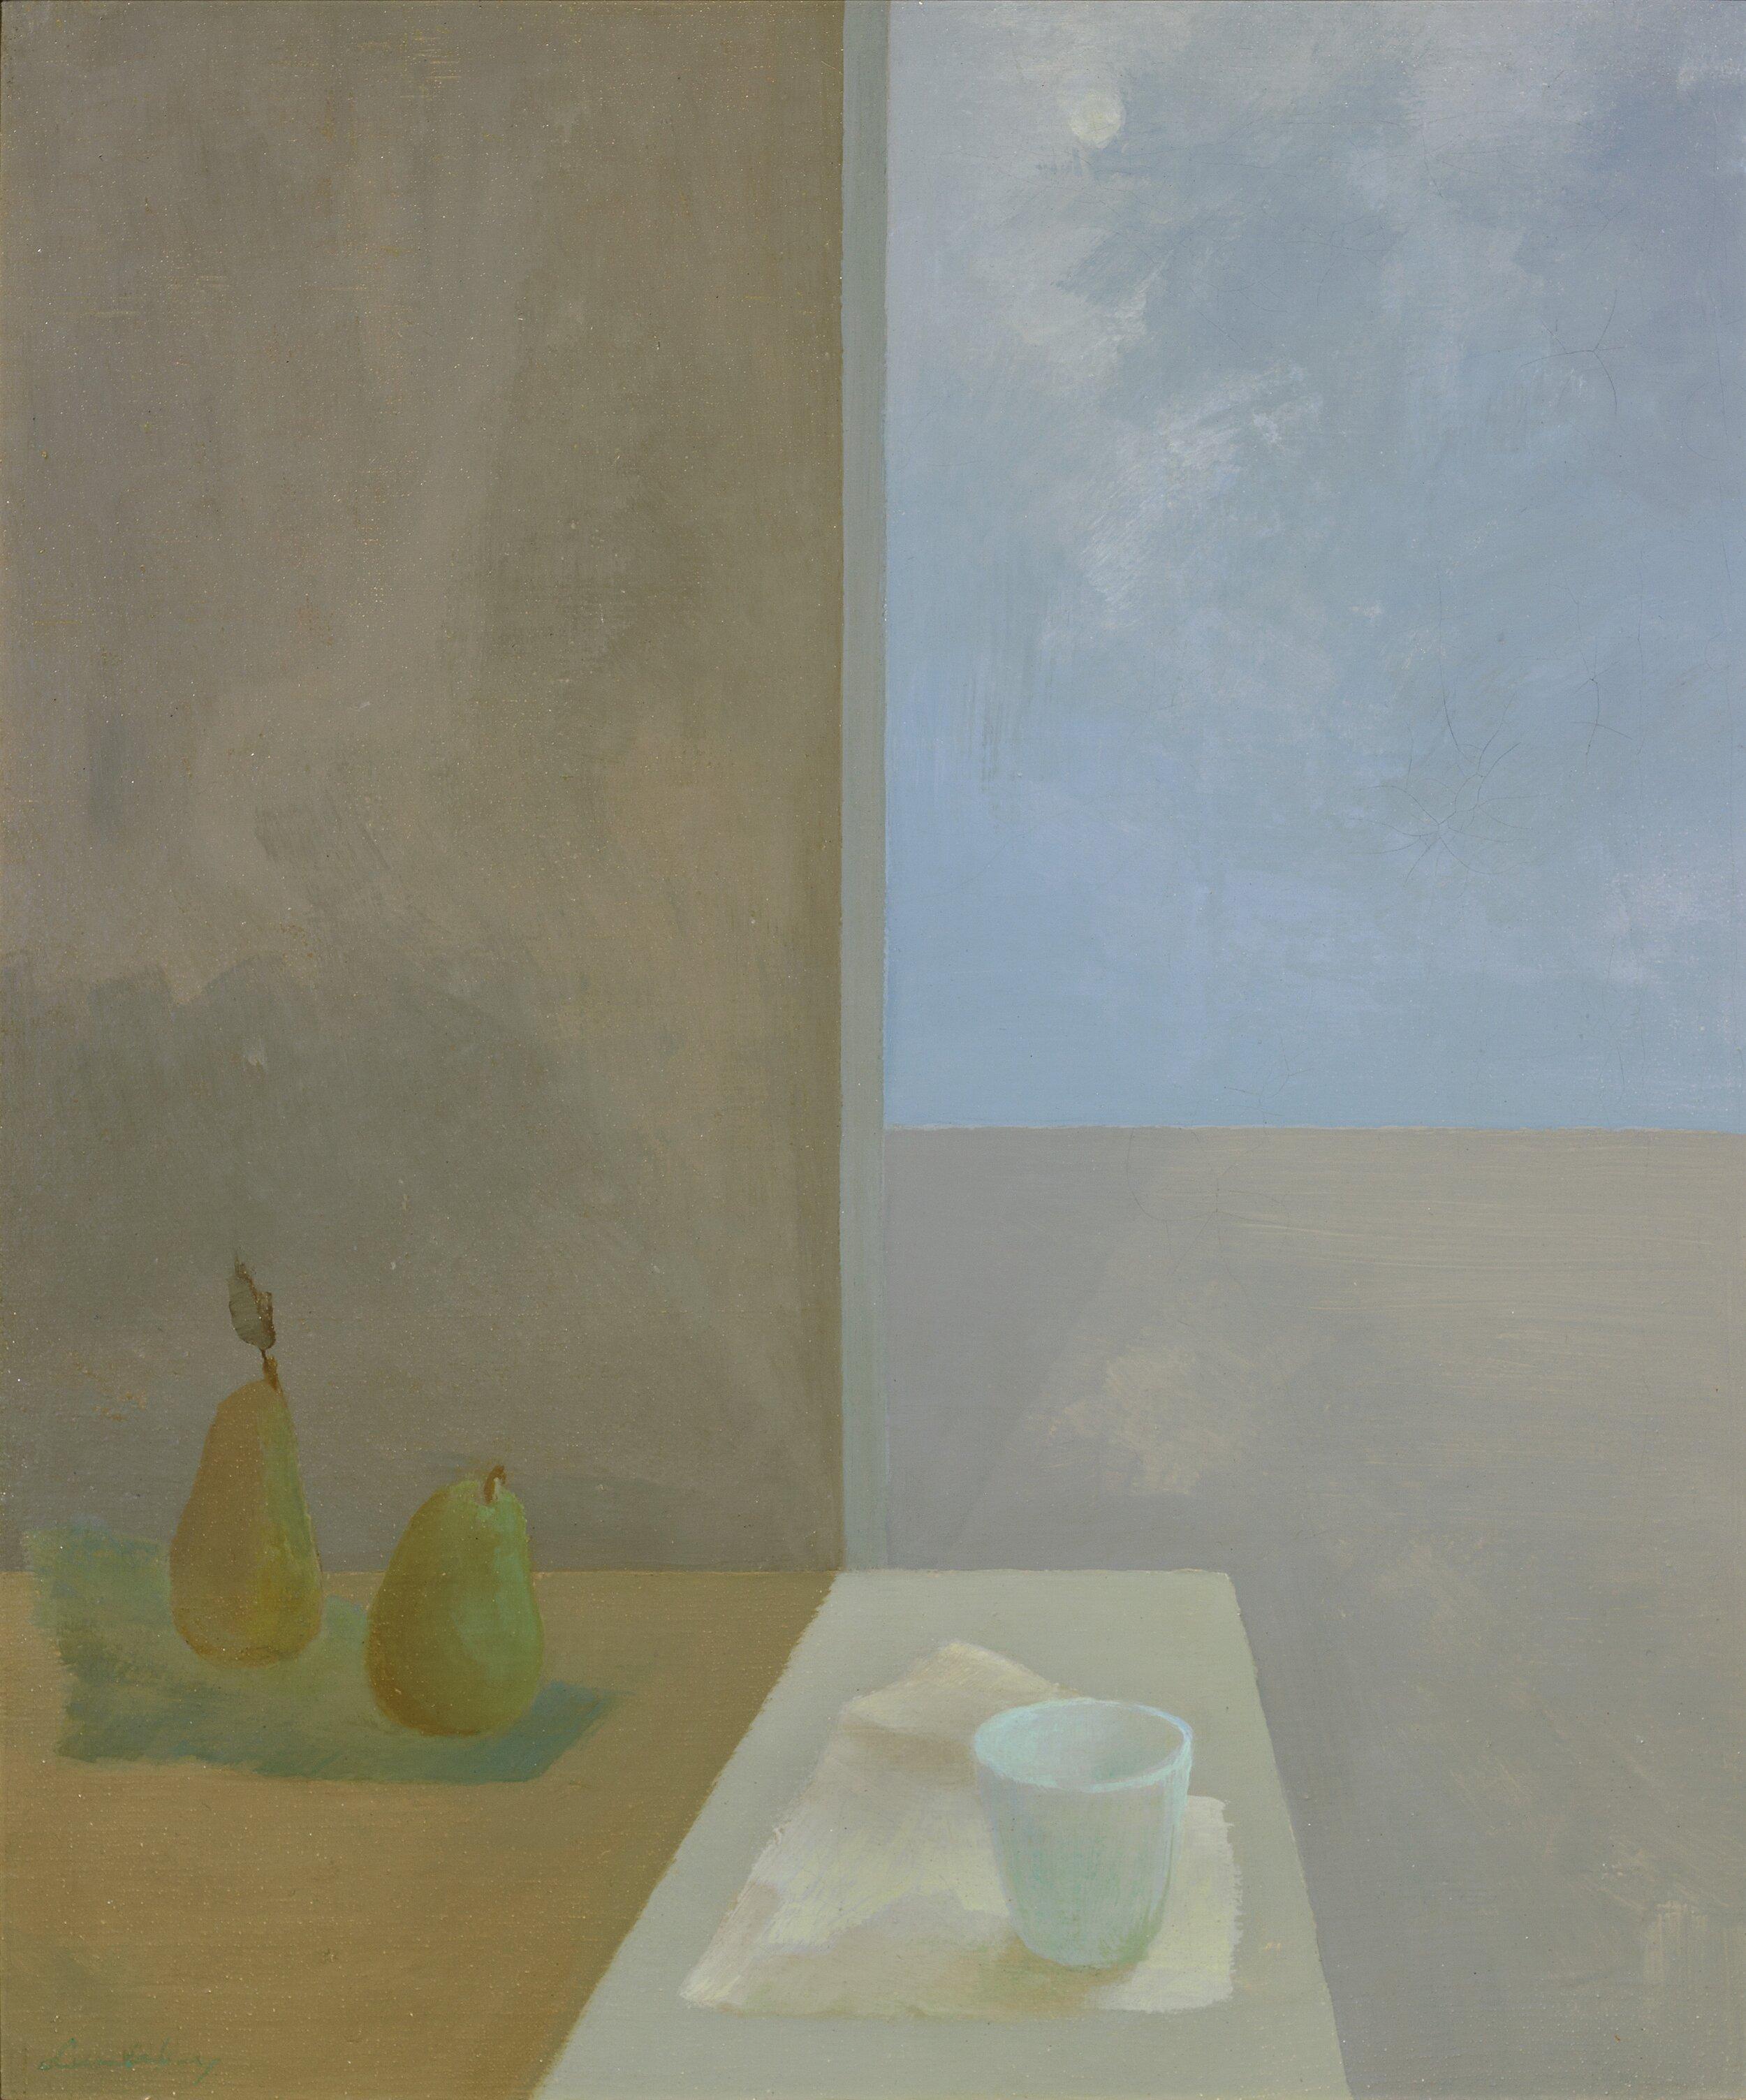 Winter Sun , 1949  oil on canvas 24 x 20 inches; 61 x 50.8 centimeters